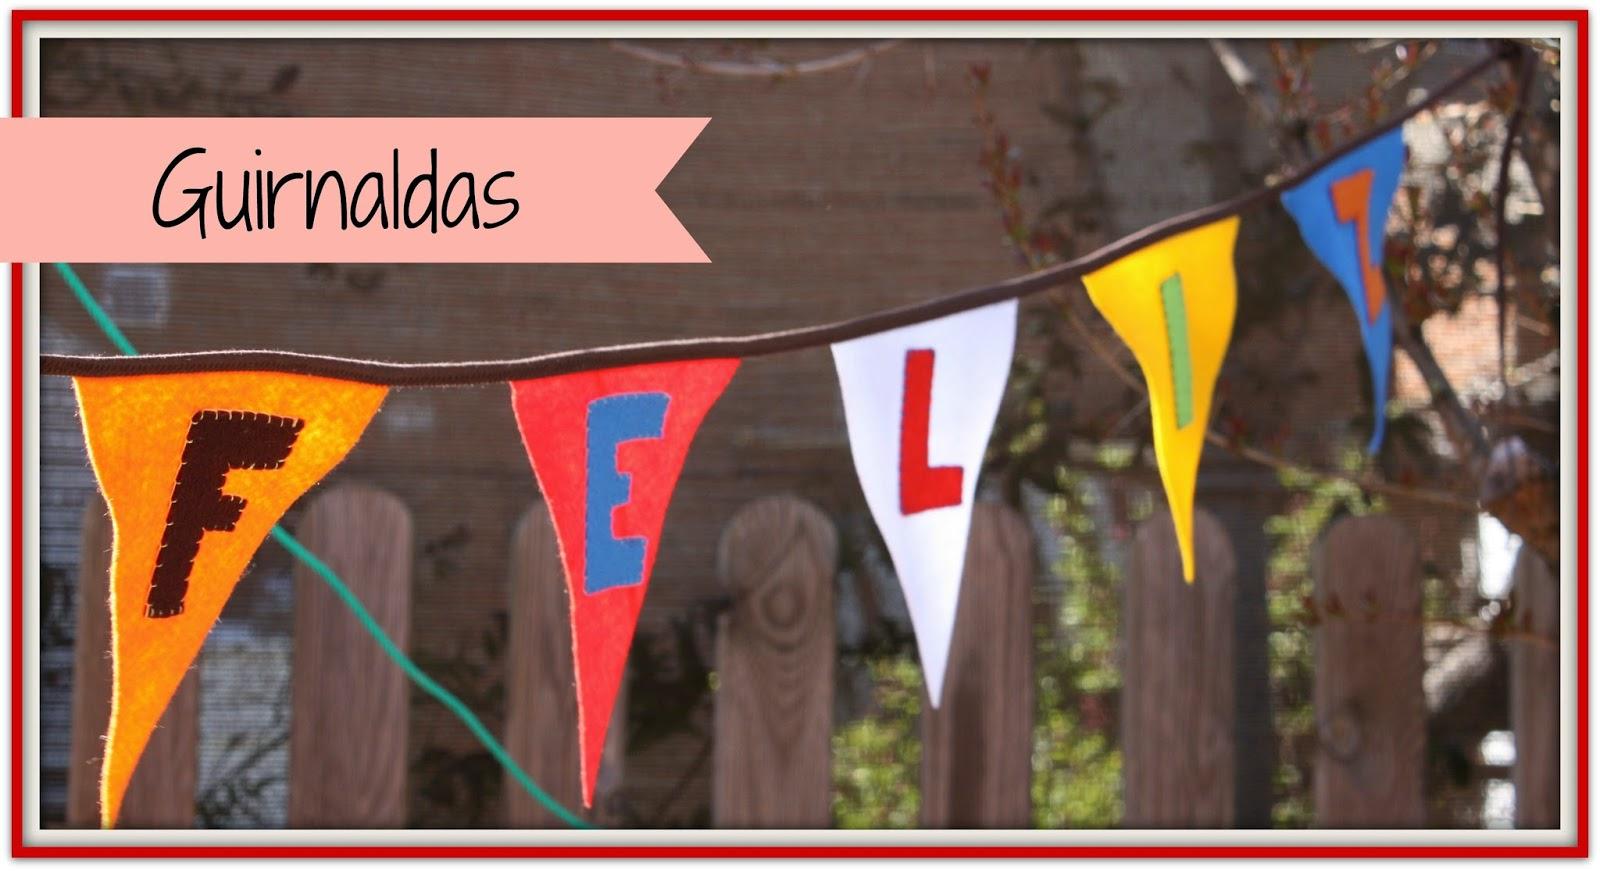 http://sandungacomplementos.blogspot.com.es/p/Guirnaldas.html